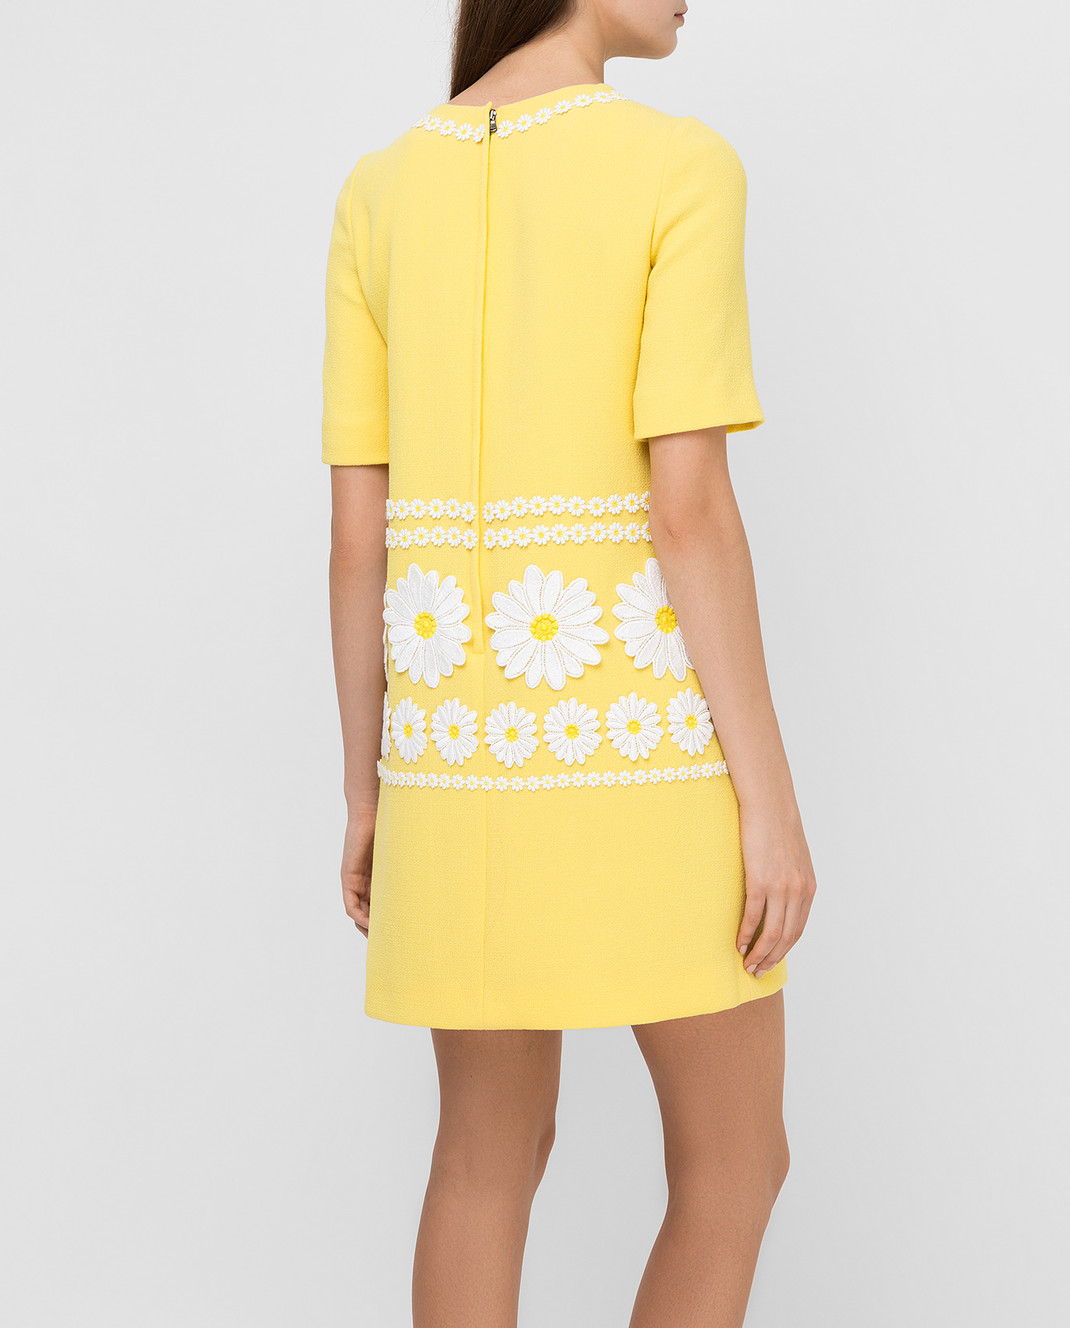 Dolce&Gabbana Желтое платье из шерсти F6UL3ZFU2TZ изображение 4